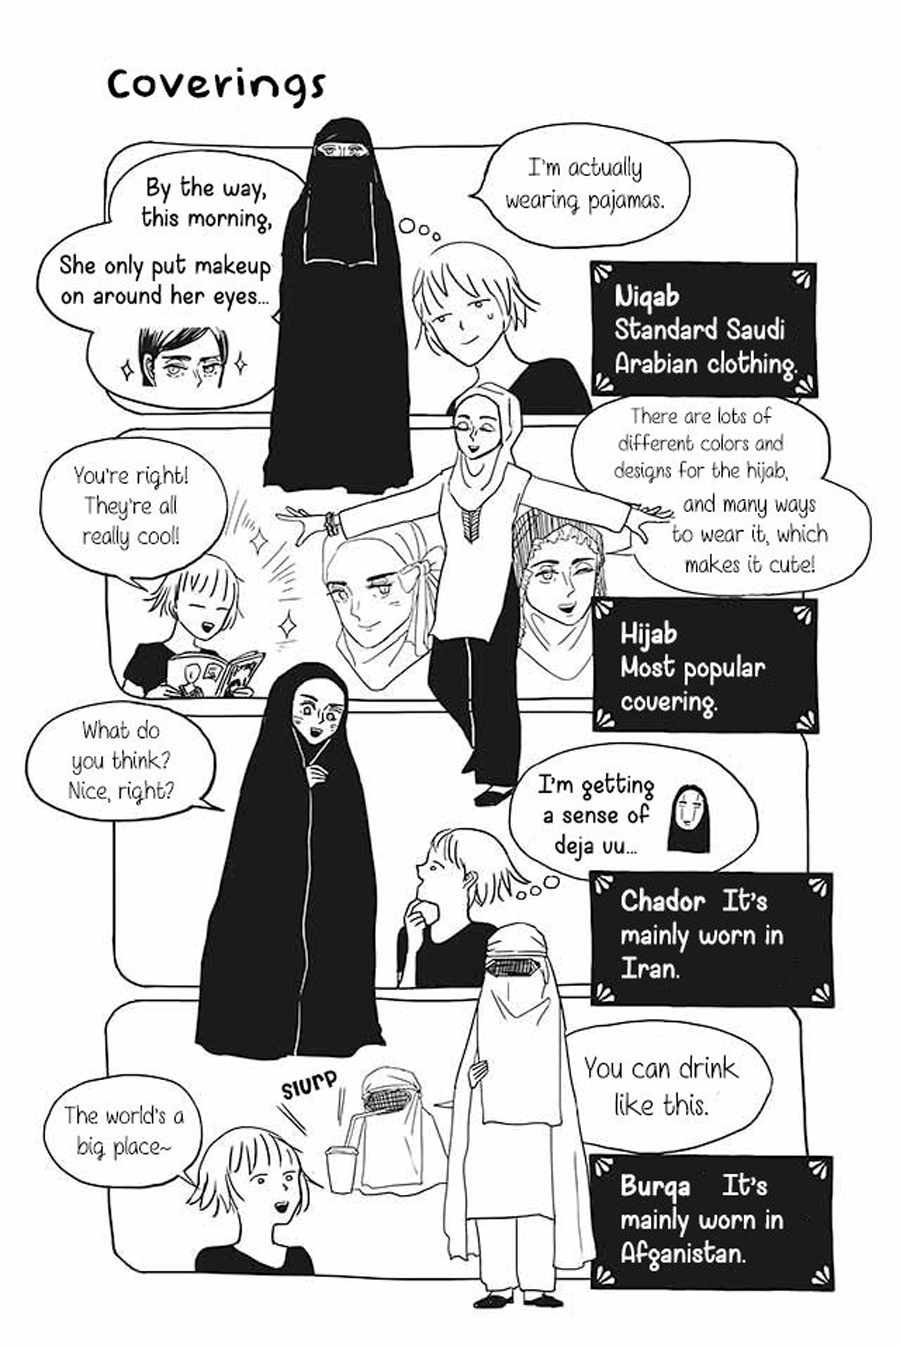 Nada Displaying Islamic Garbs